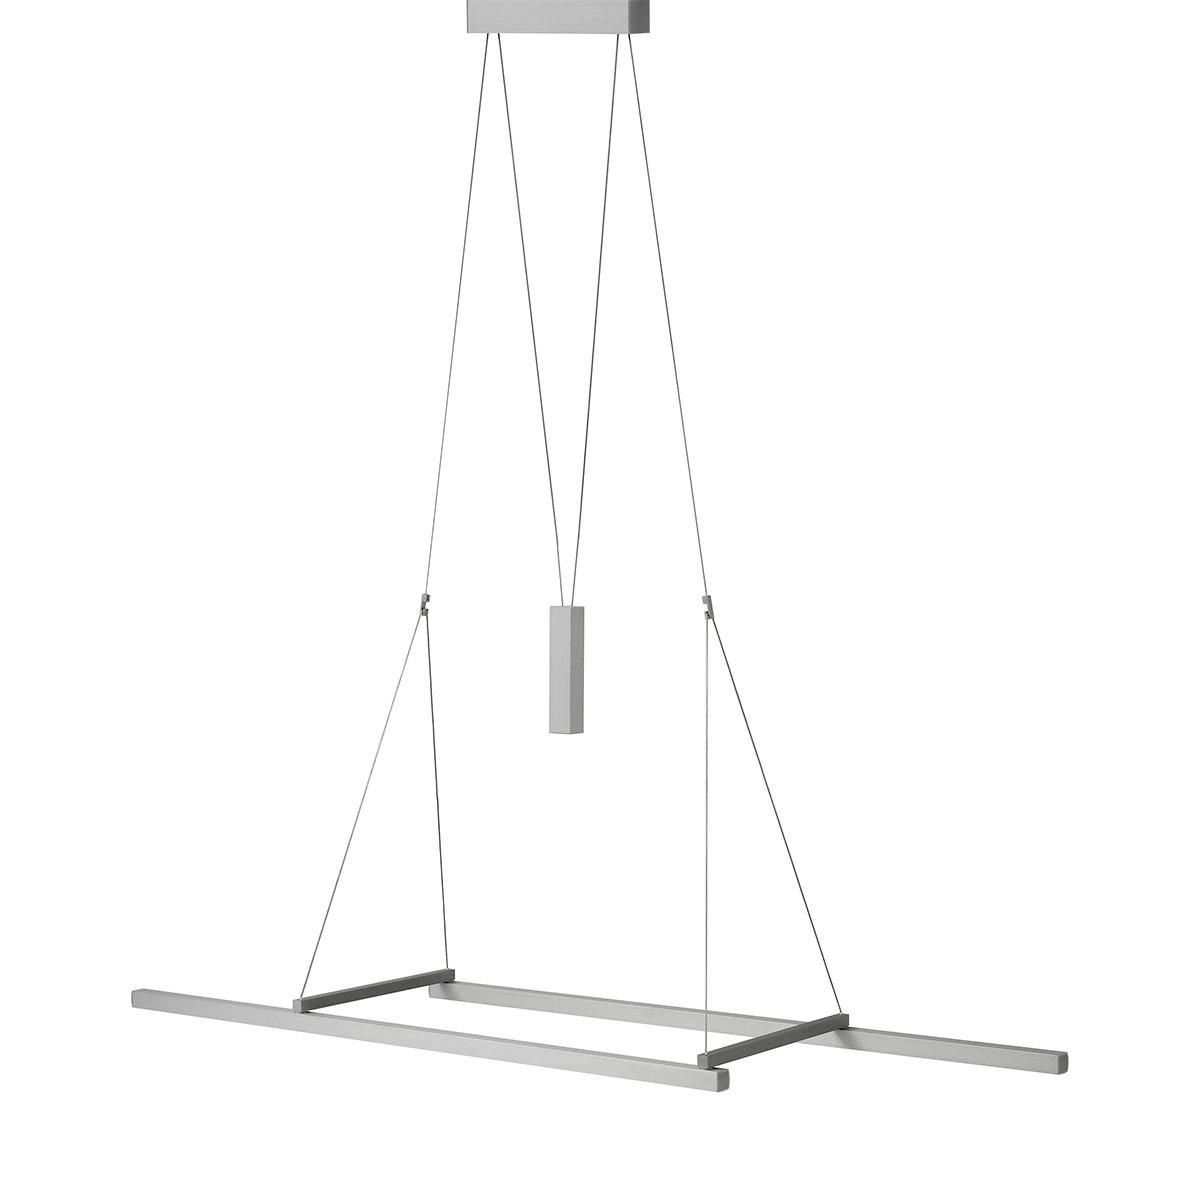 Byok Squadra Pendelleuchte, Länge: 125 cm, Aluminium matt